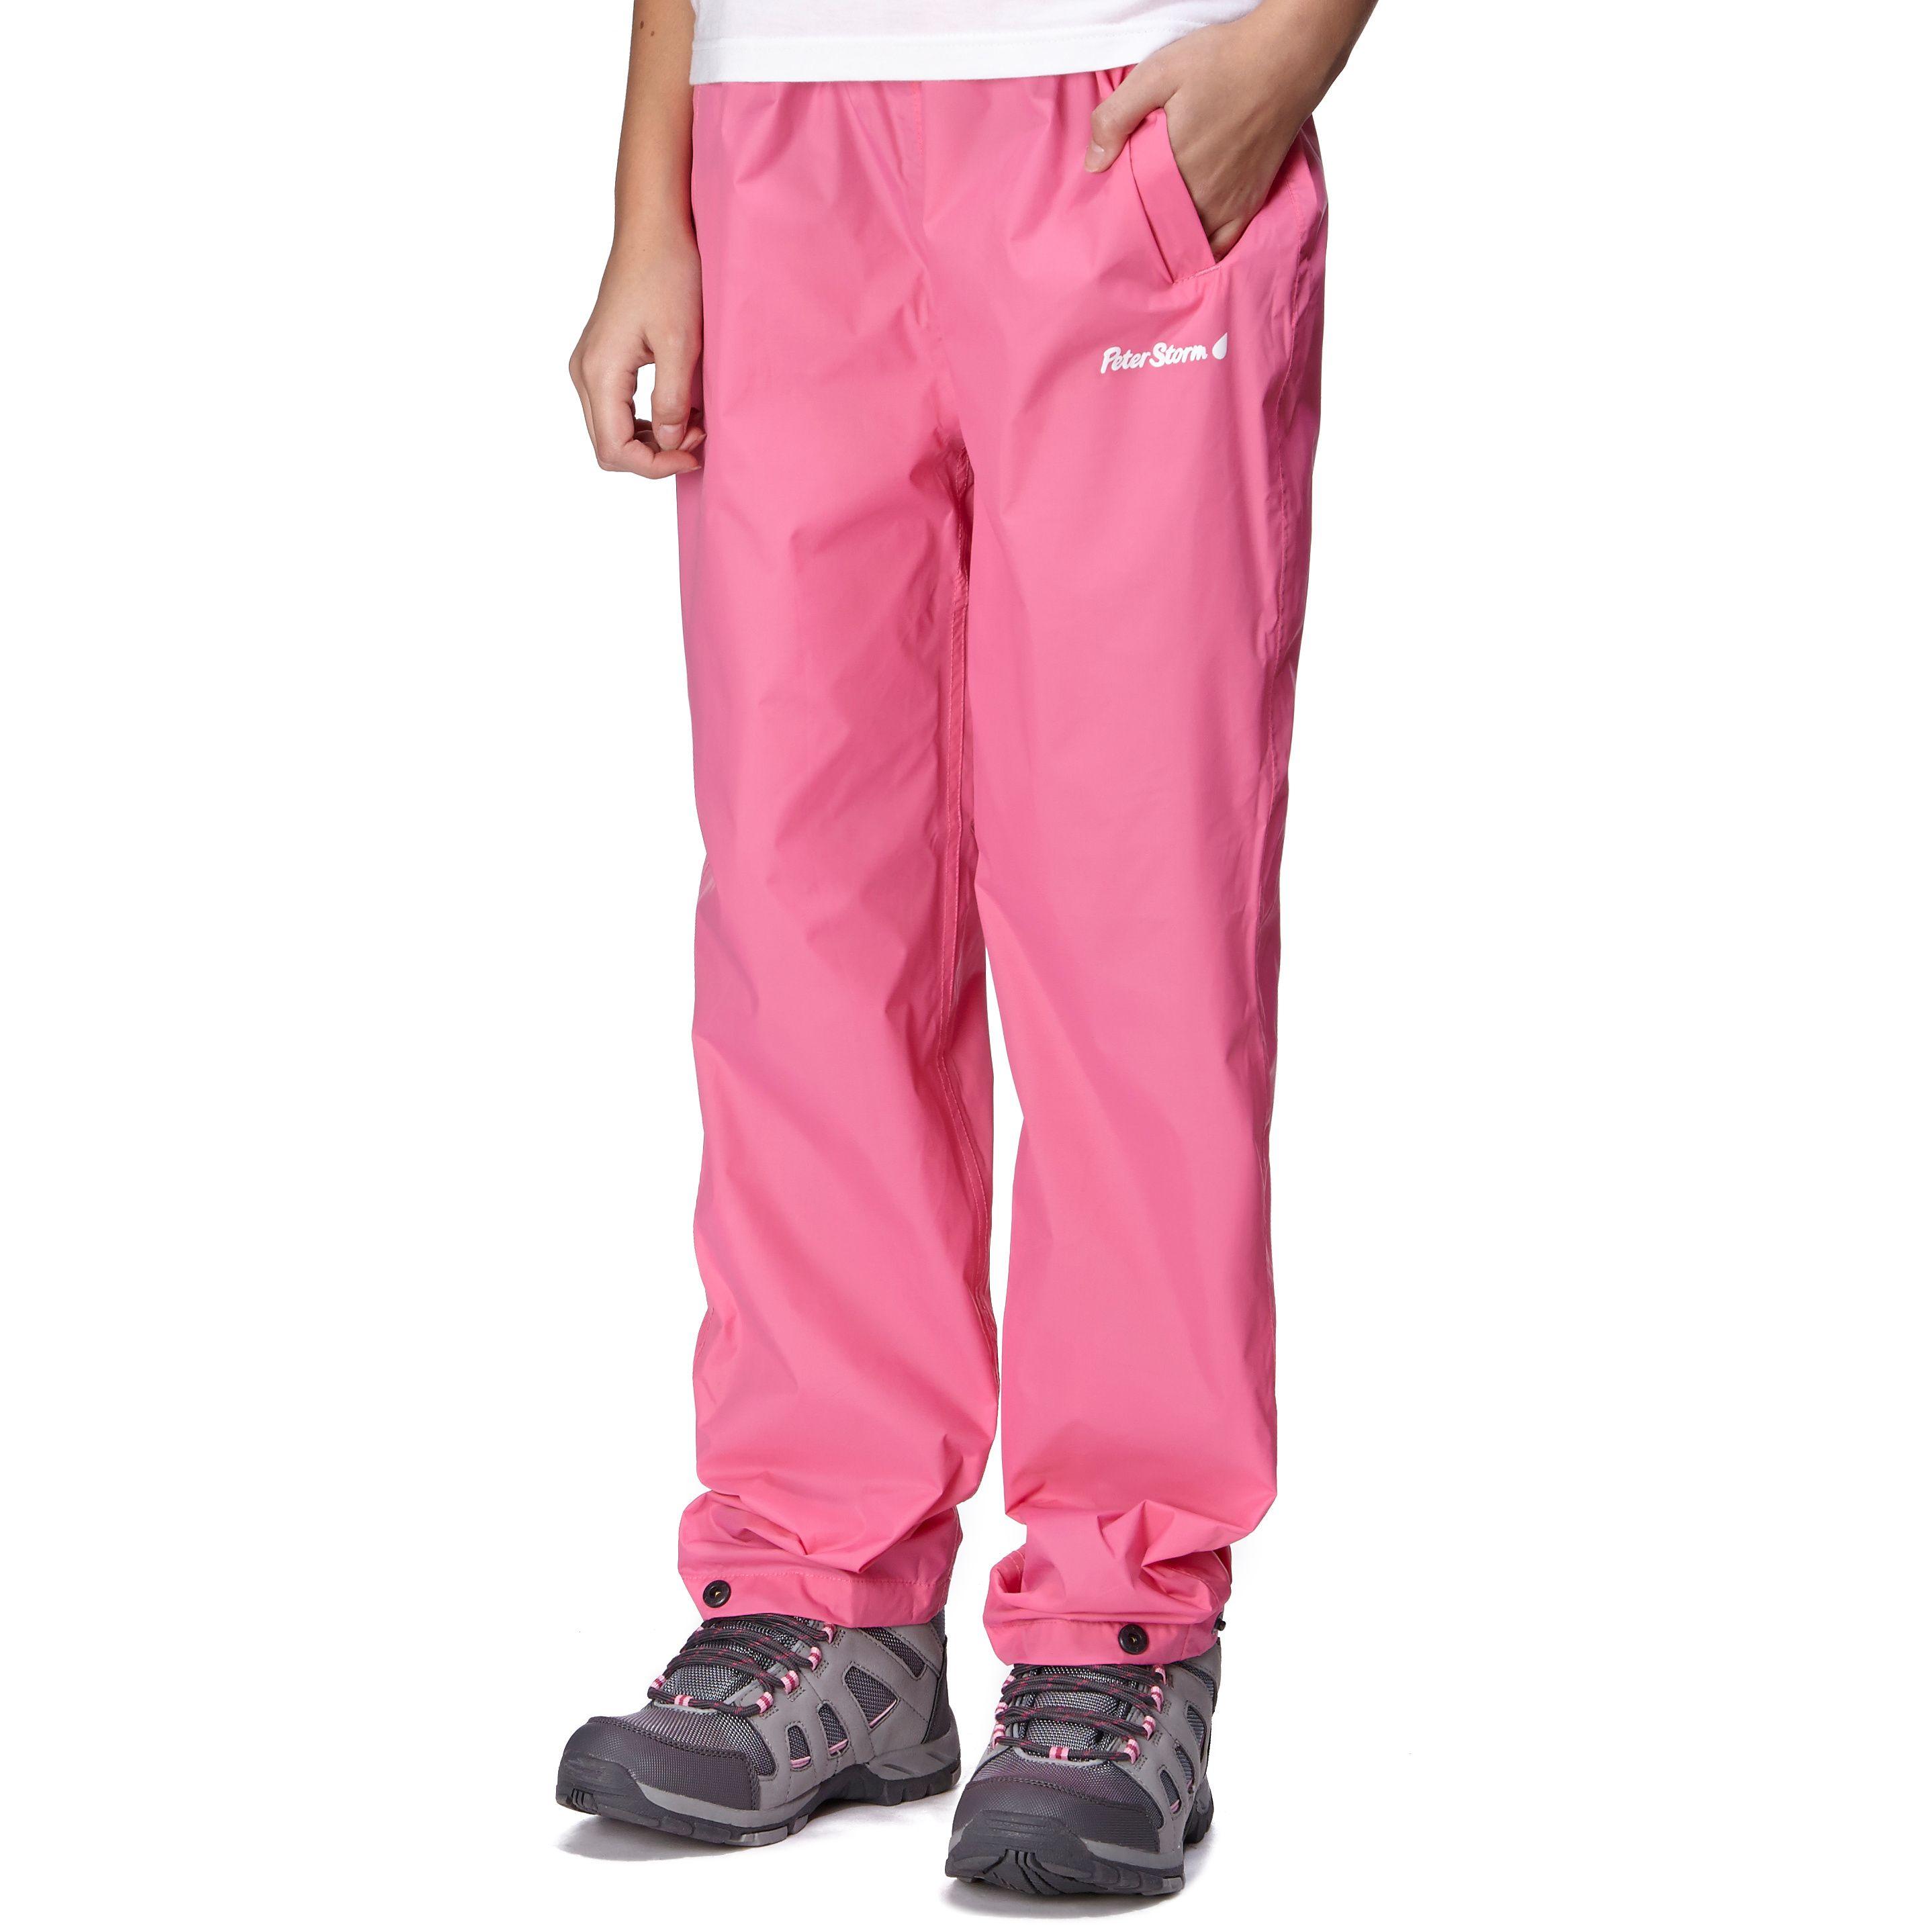 PETER STORM Girls' Packable Pants